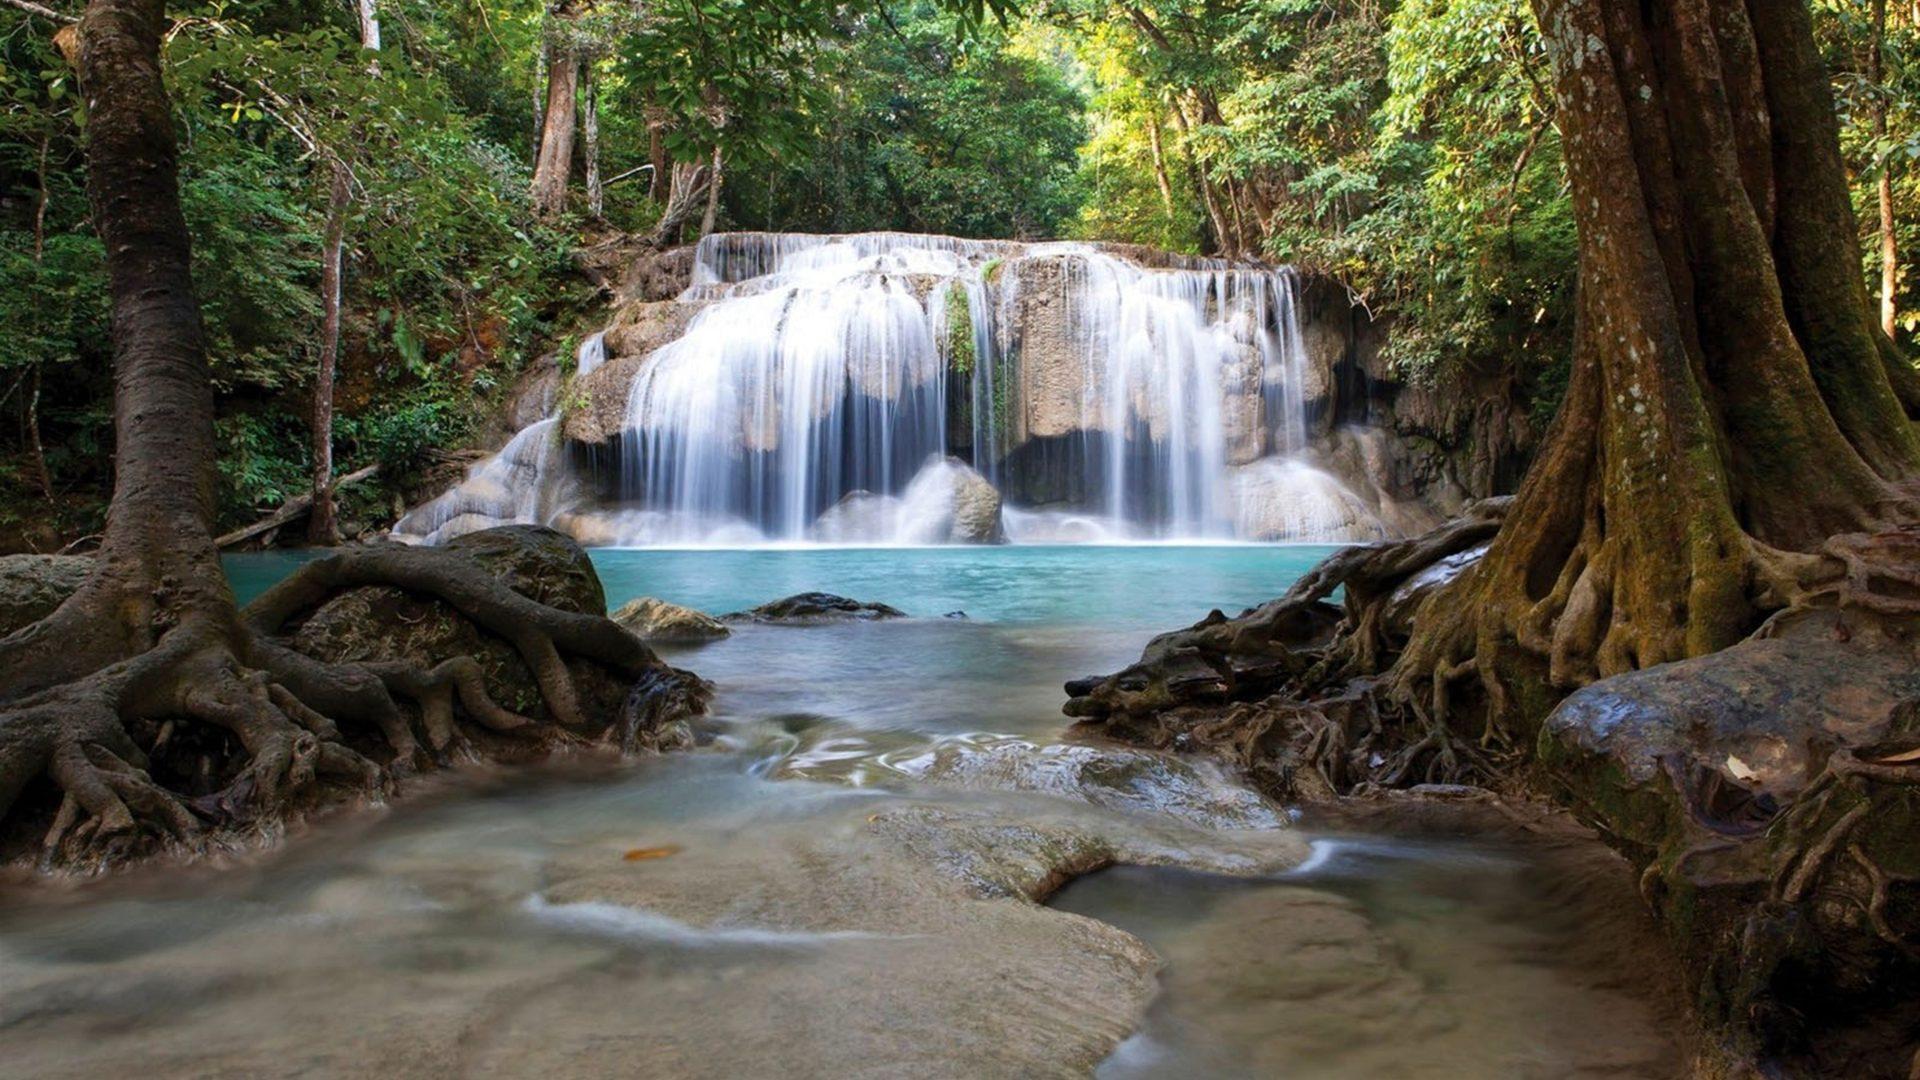 Falls Hd Wallpaper Free Download Waterfall Erawan National Park Thailand 017458